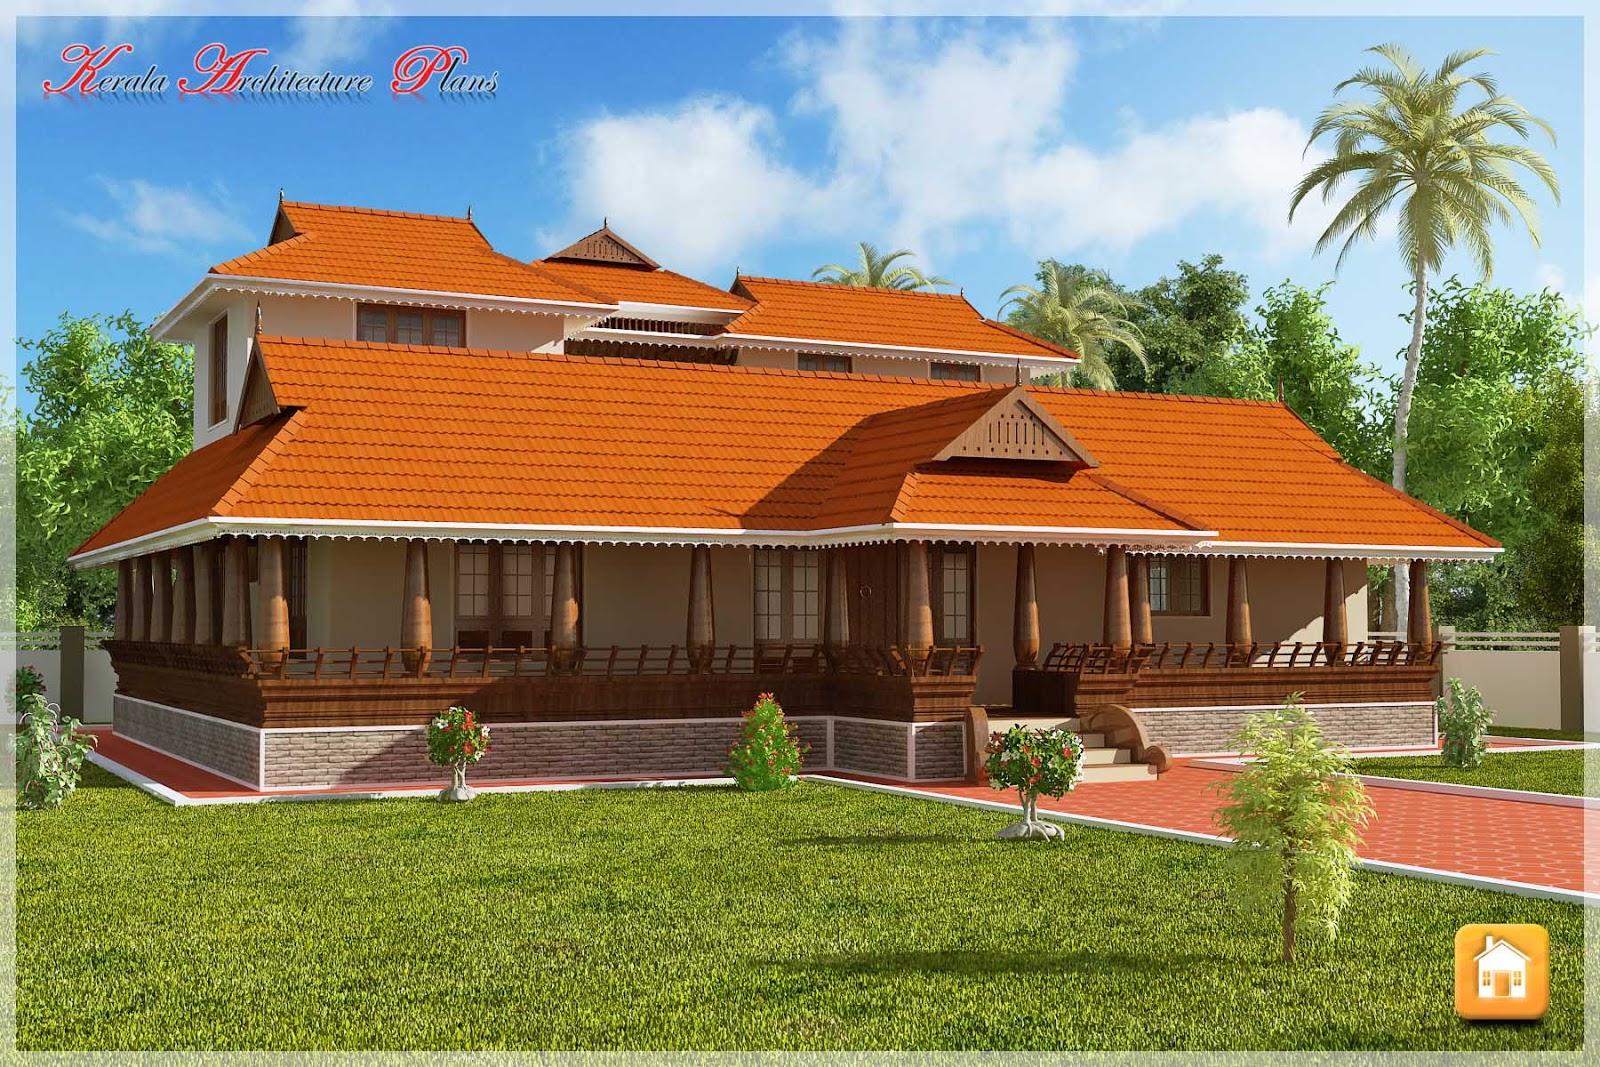 House With Nadumuttam And Nalukettu Style Architecture ... on